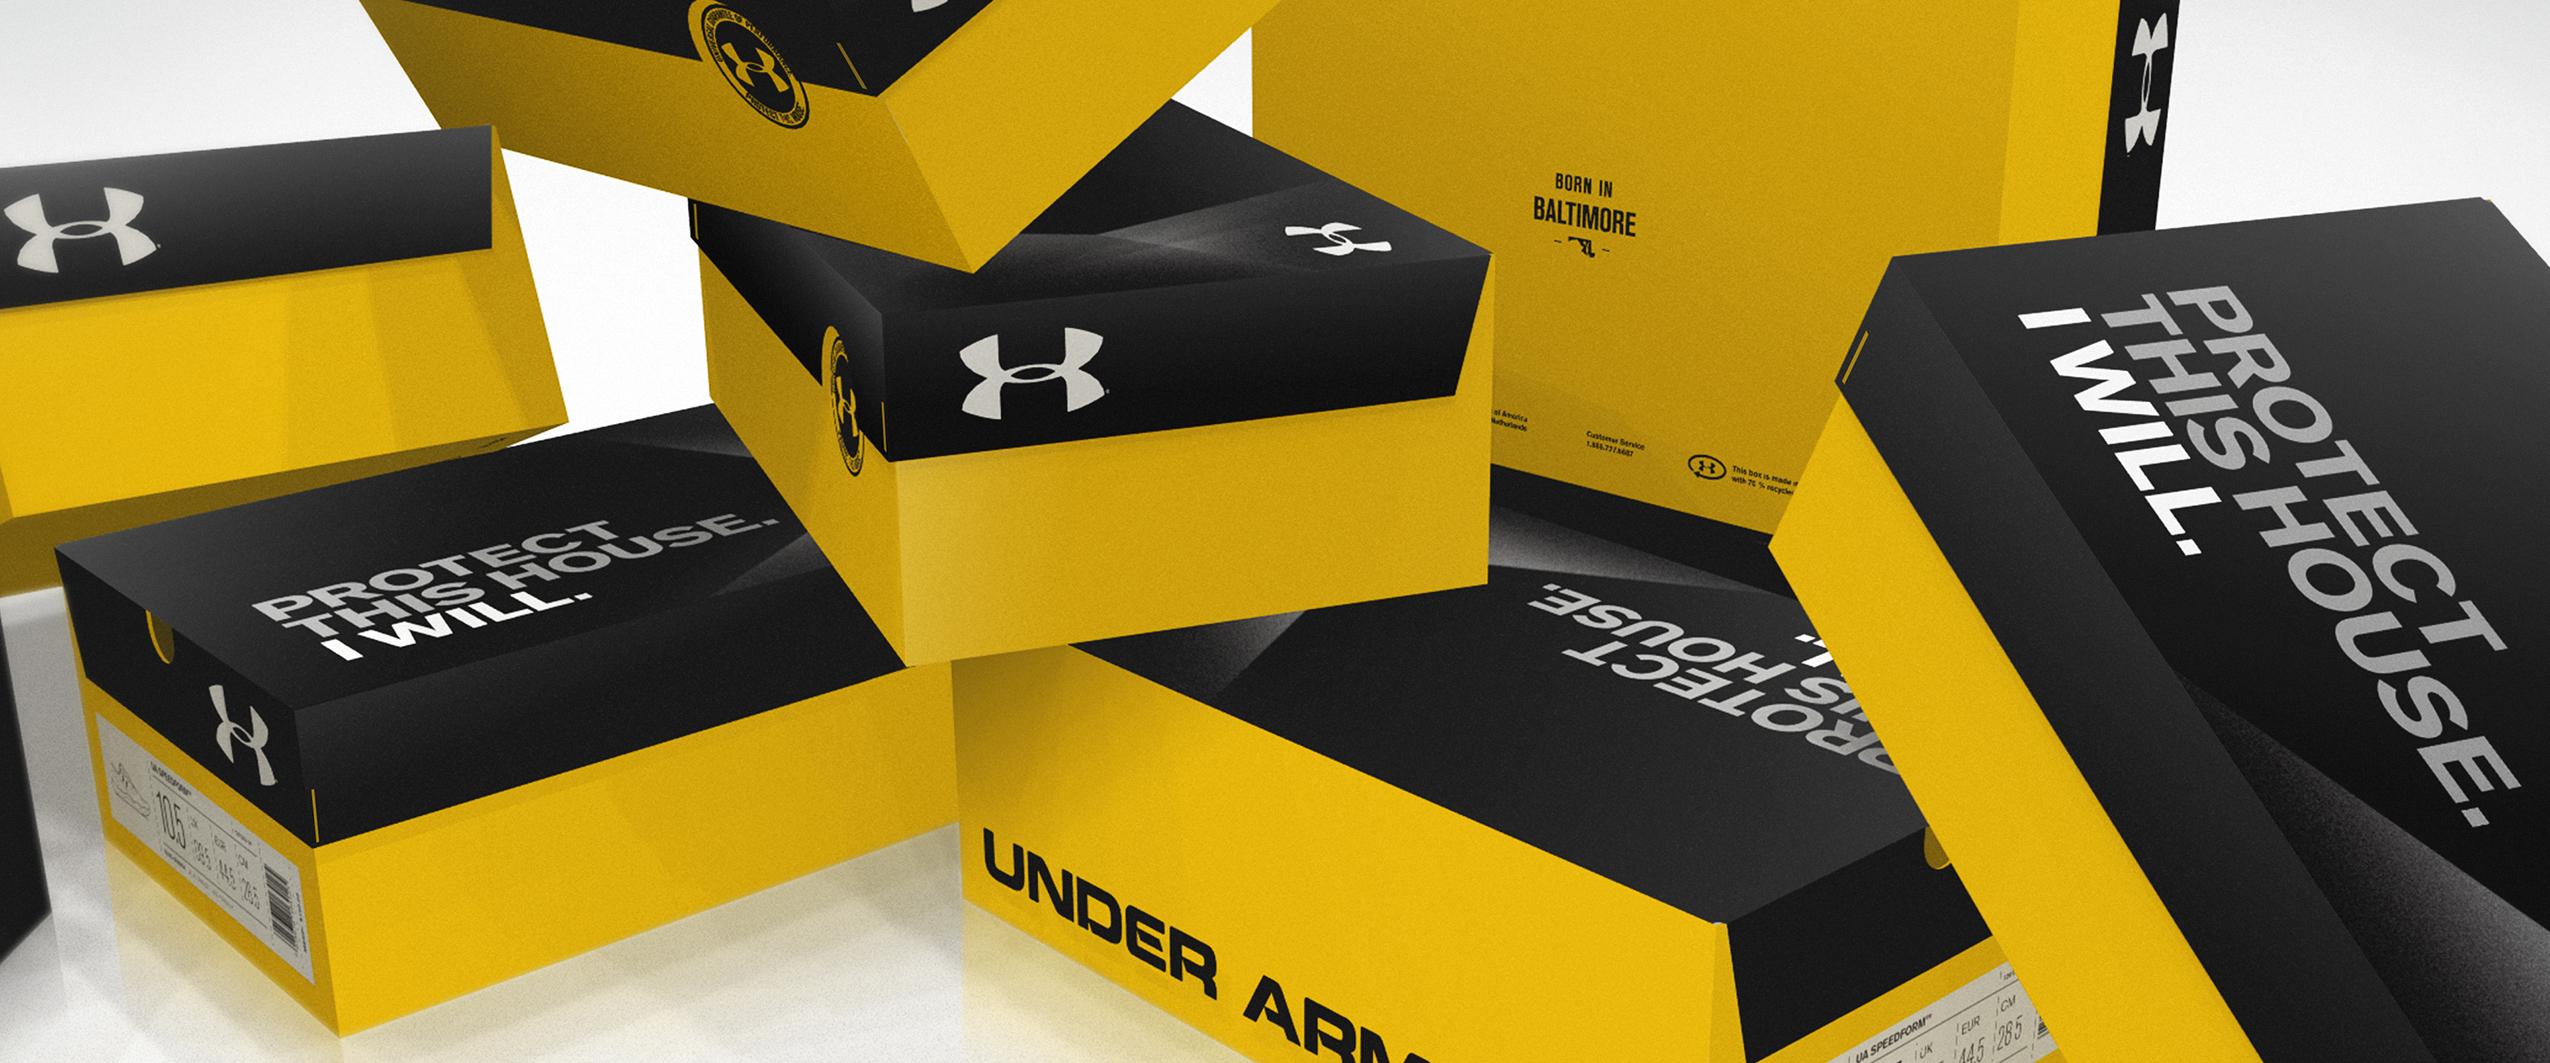 UA Footwear Box